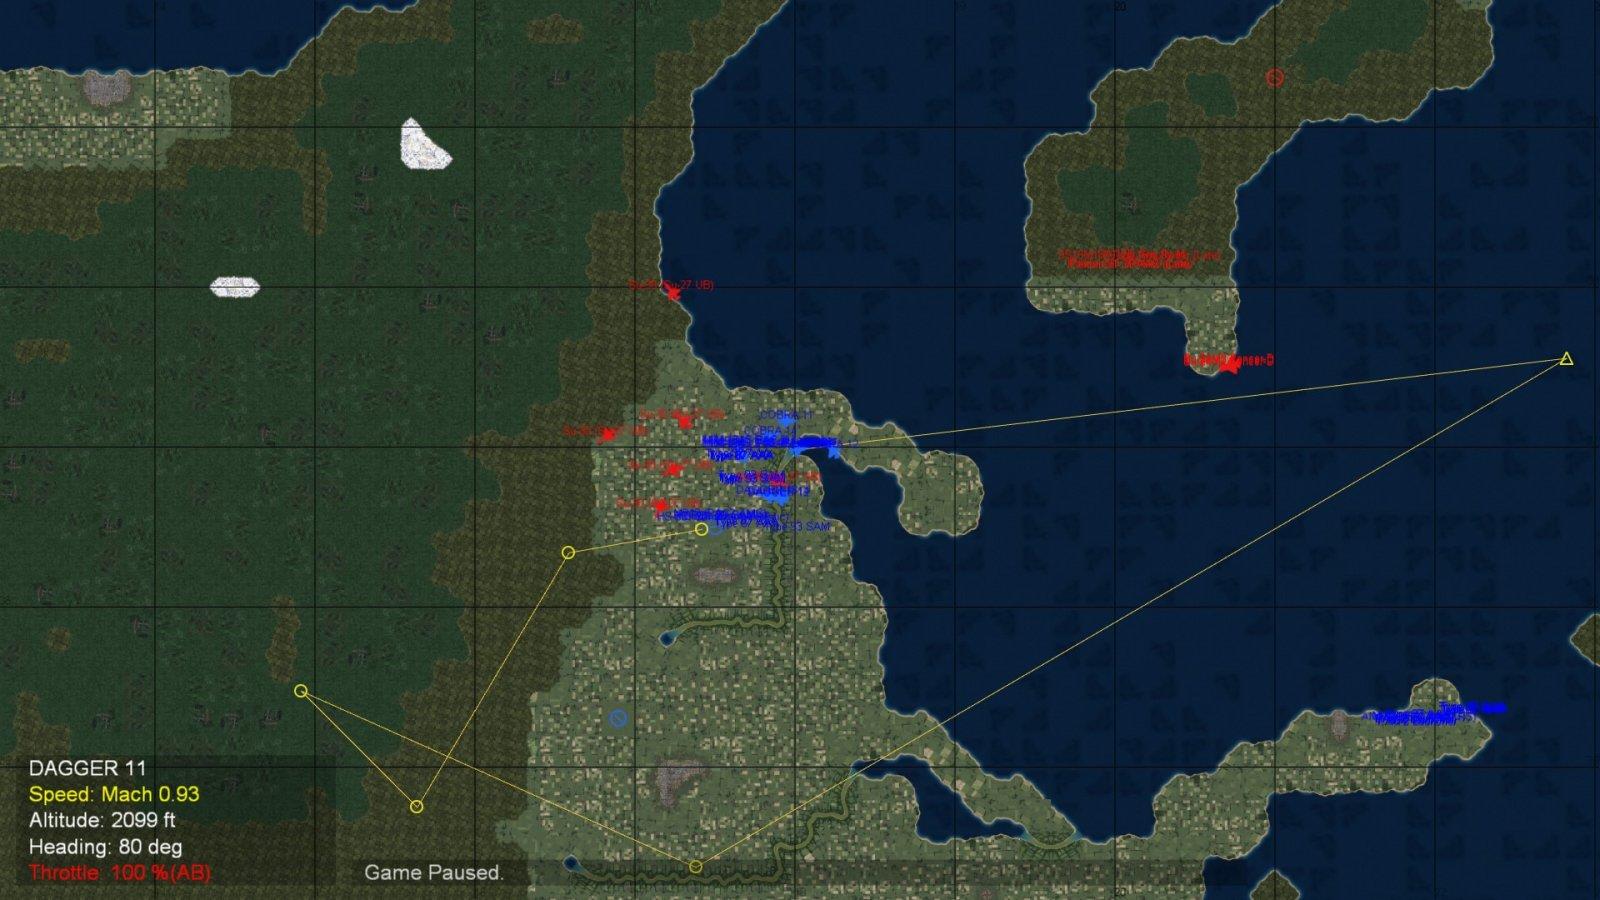 A Screenshot of A Tactical Map During the Russian Mass Retaliatory Strike